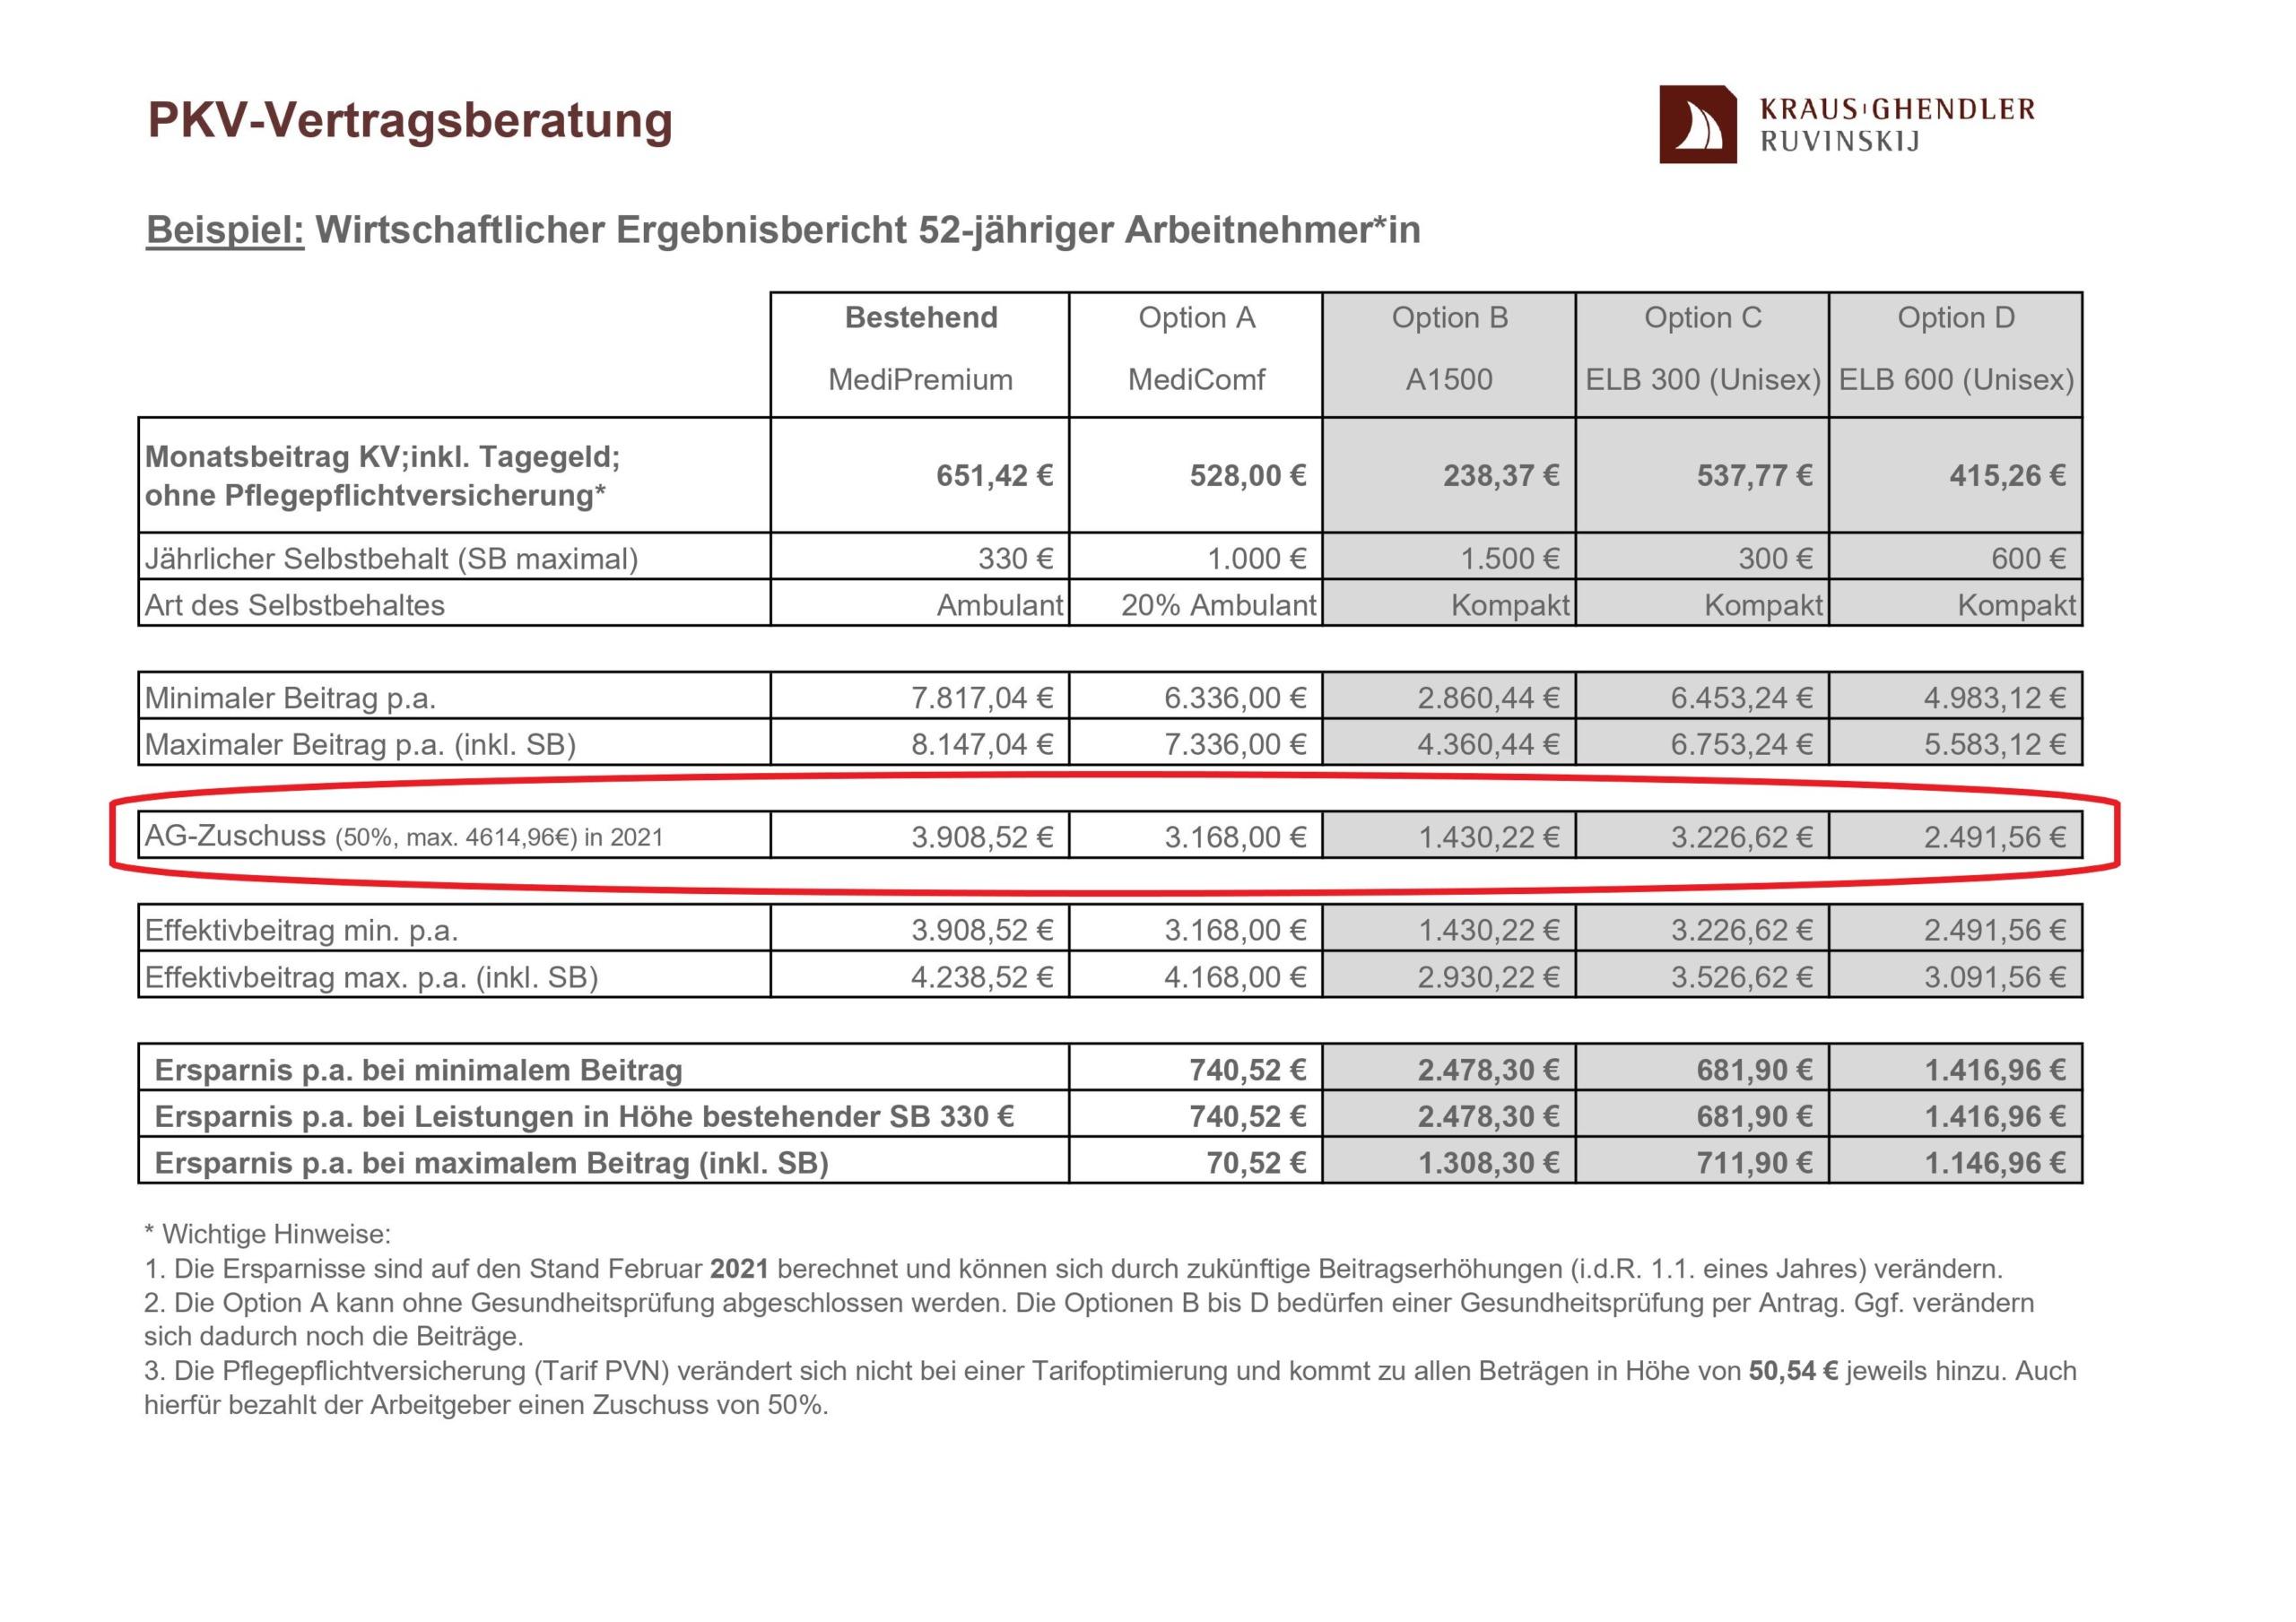 PKV-Vertragsberatung_Ergebnisbericht